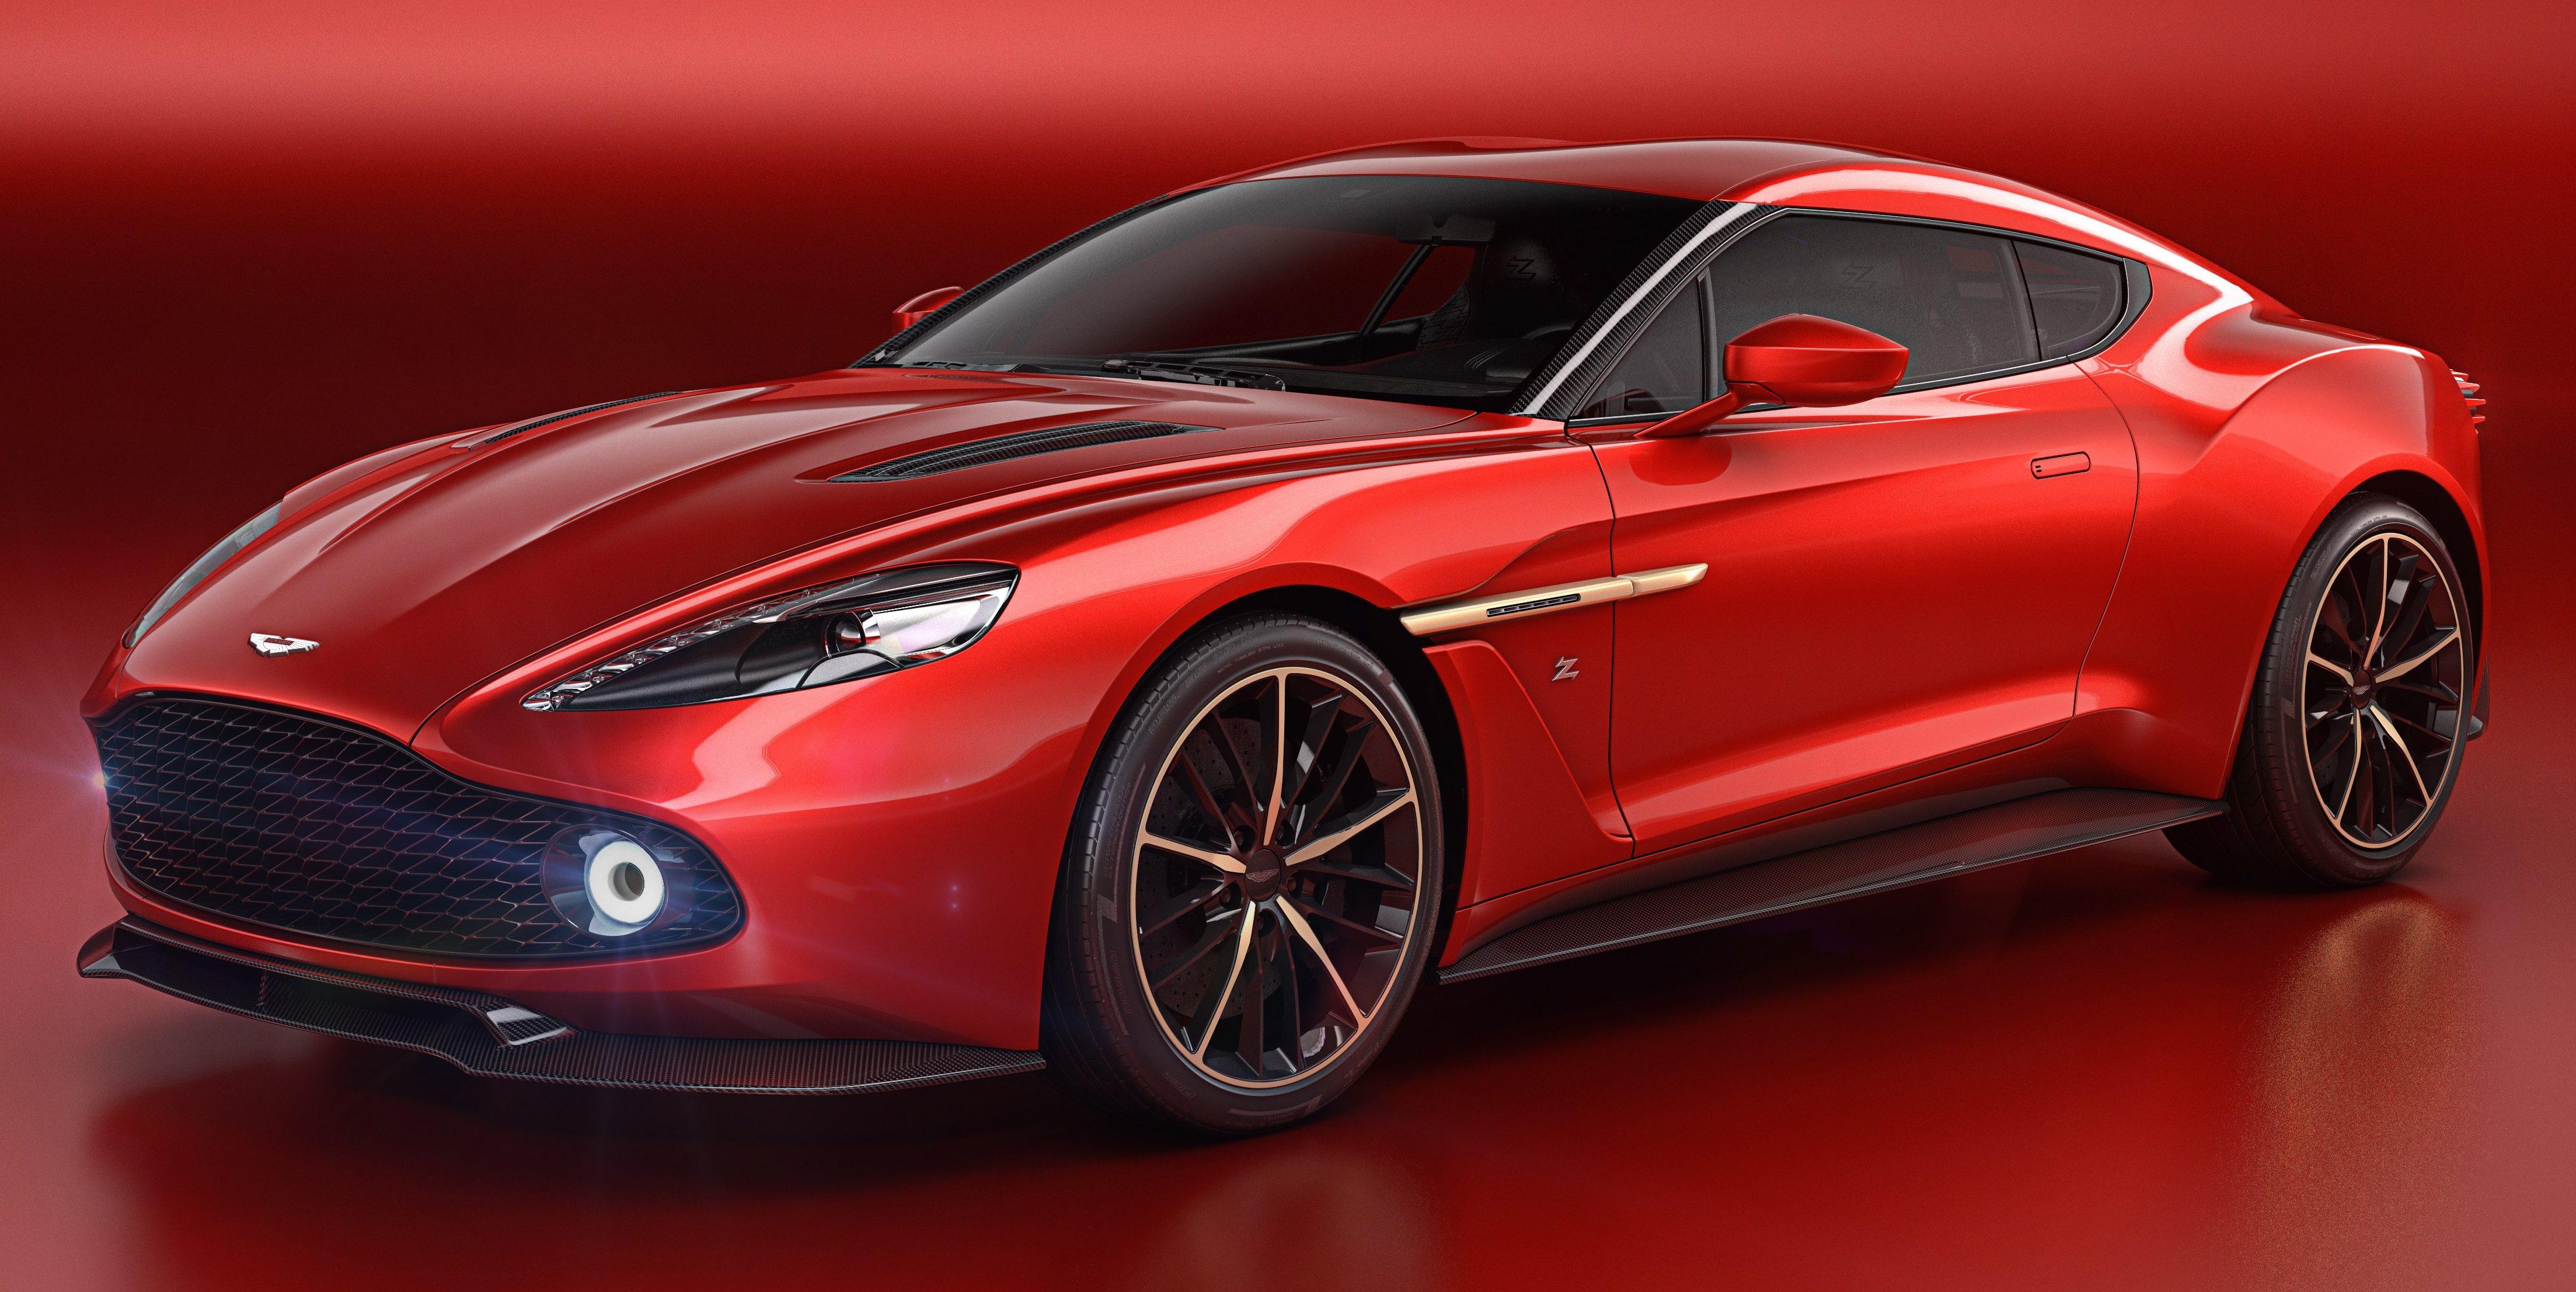 What Is Vanquish >> Aston Martin Vanquish Zagato Concept unveiled Image 496712